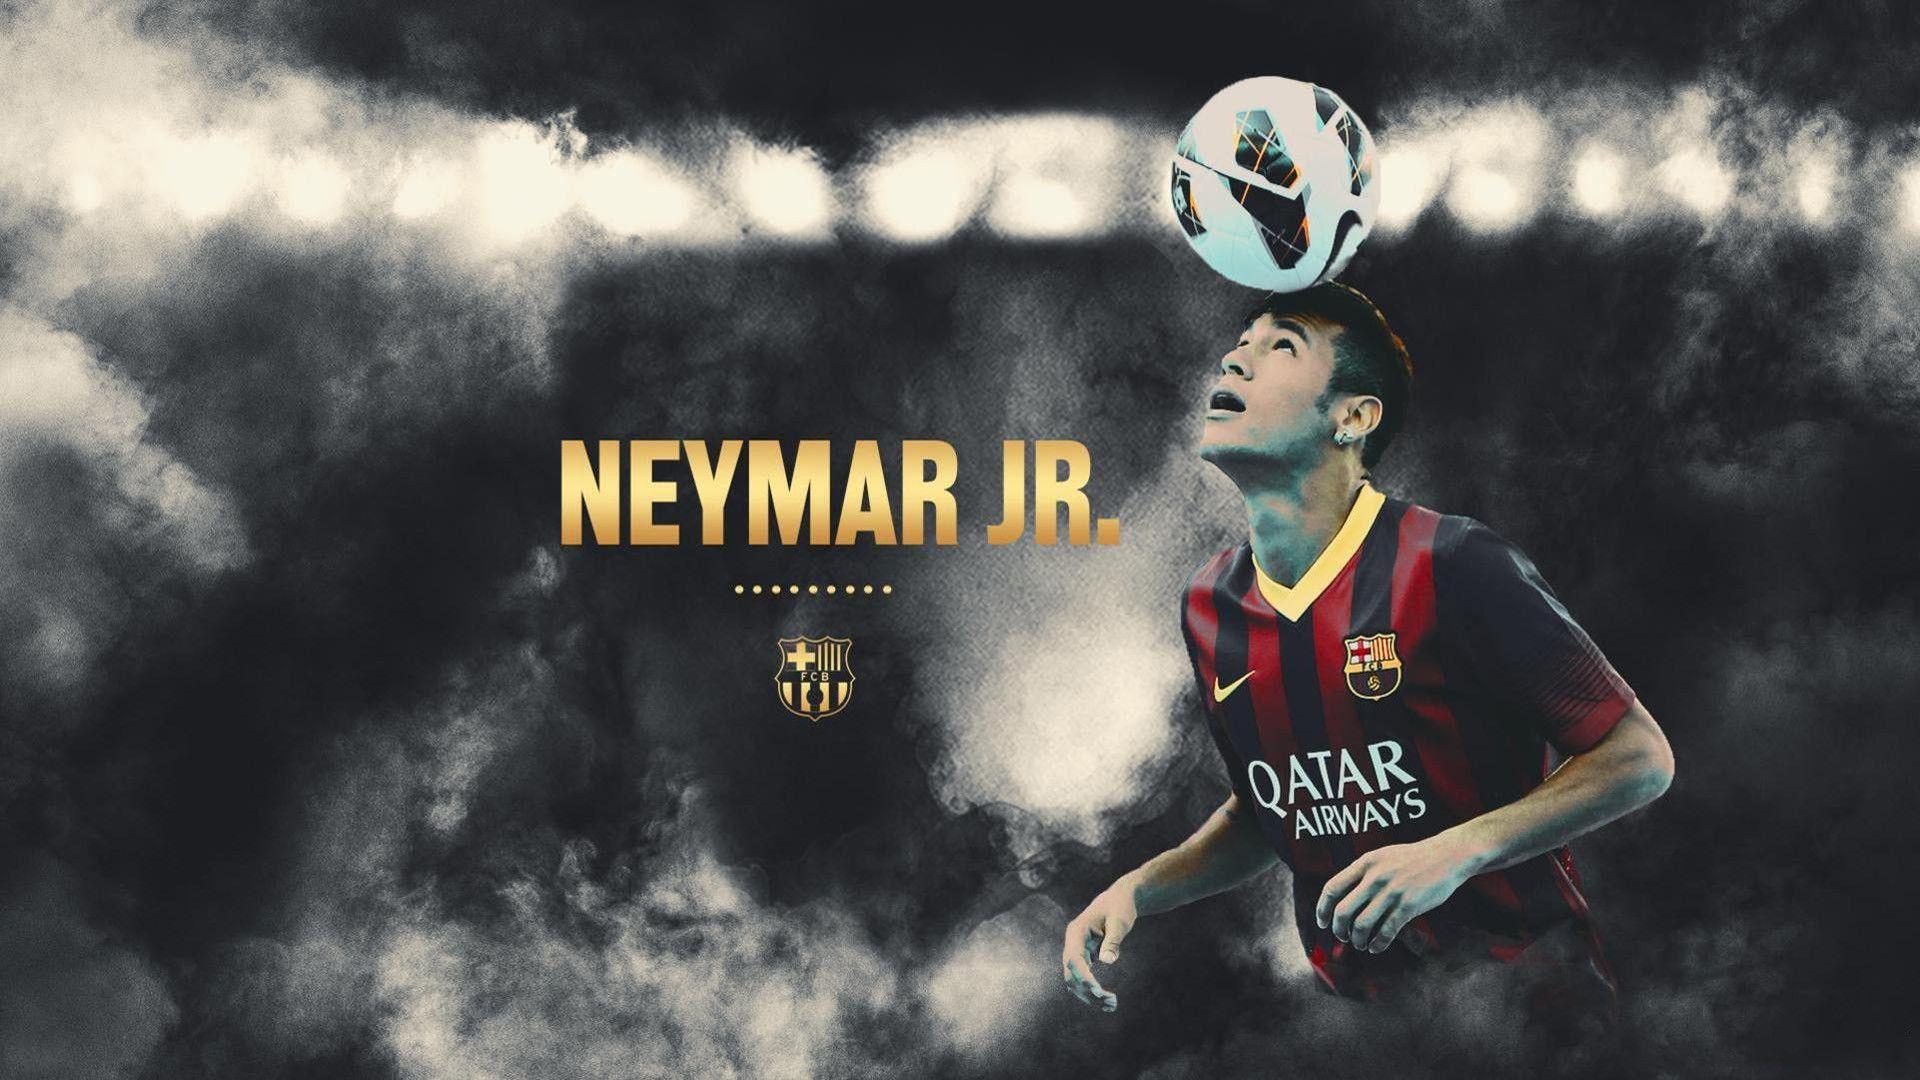 neymar wallpaper neymar jr wallpaper